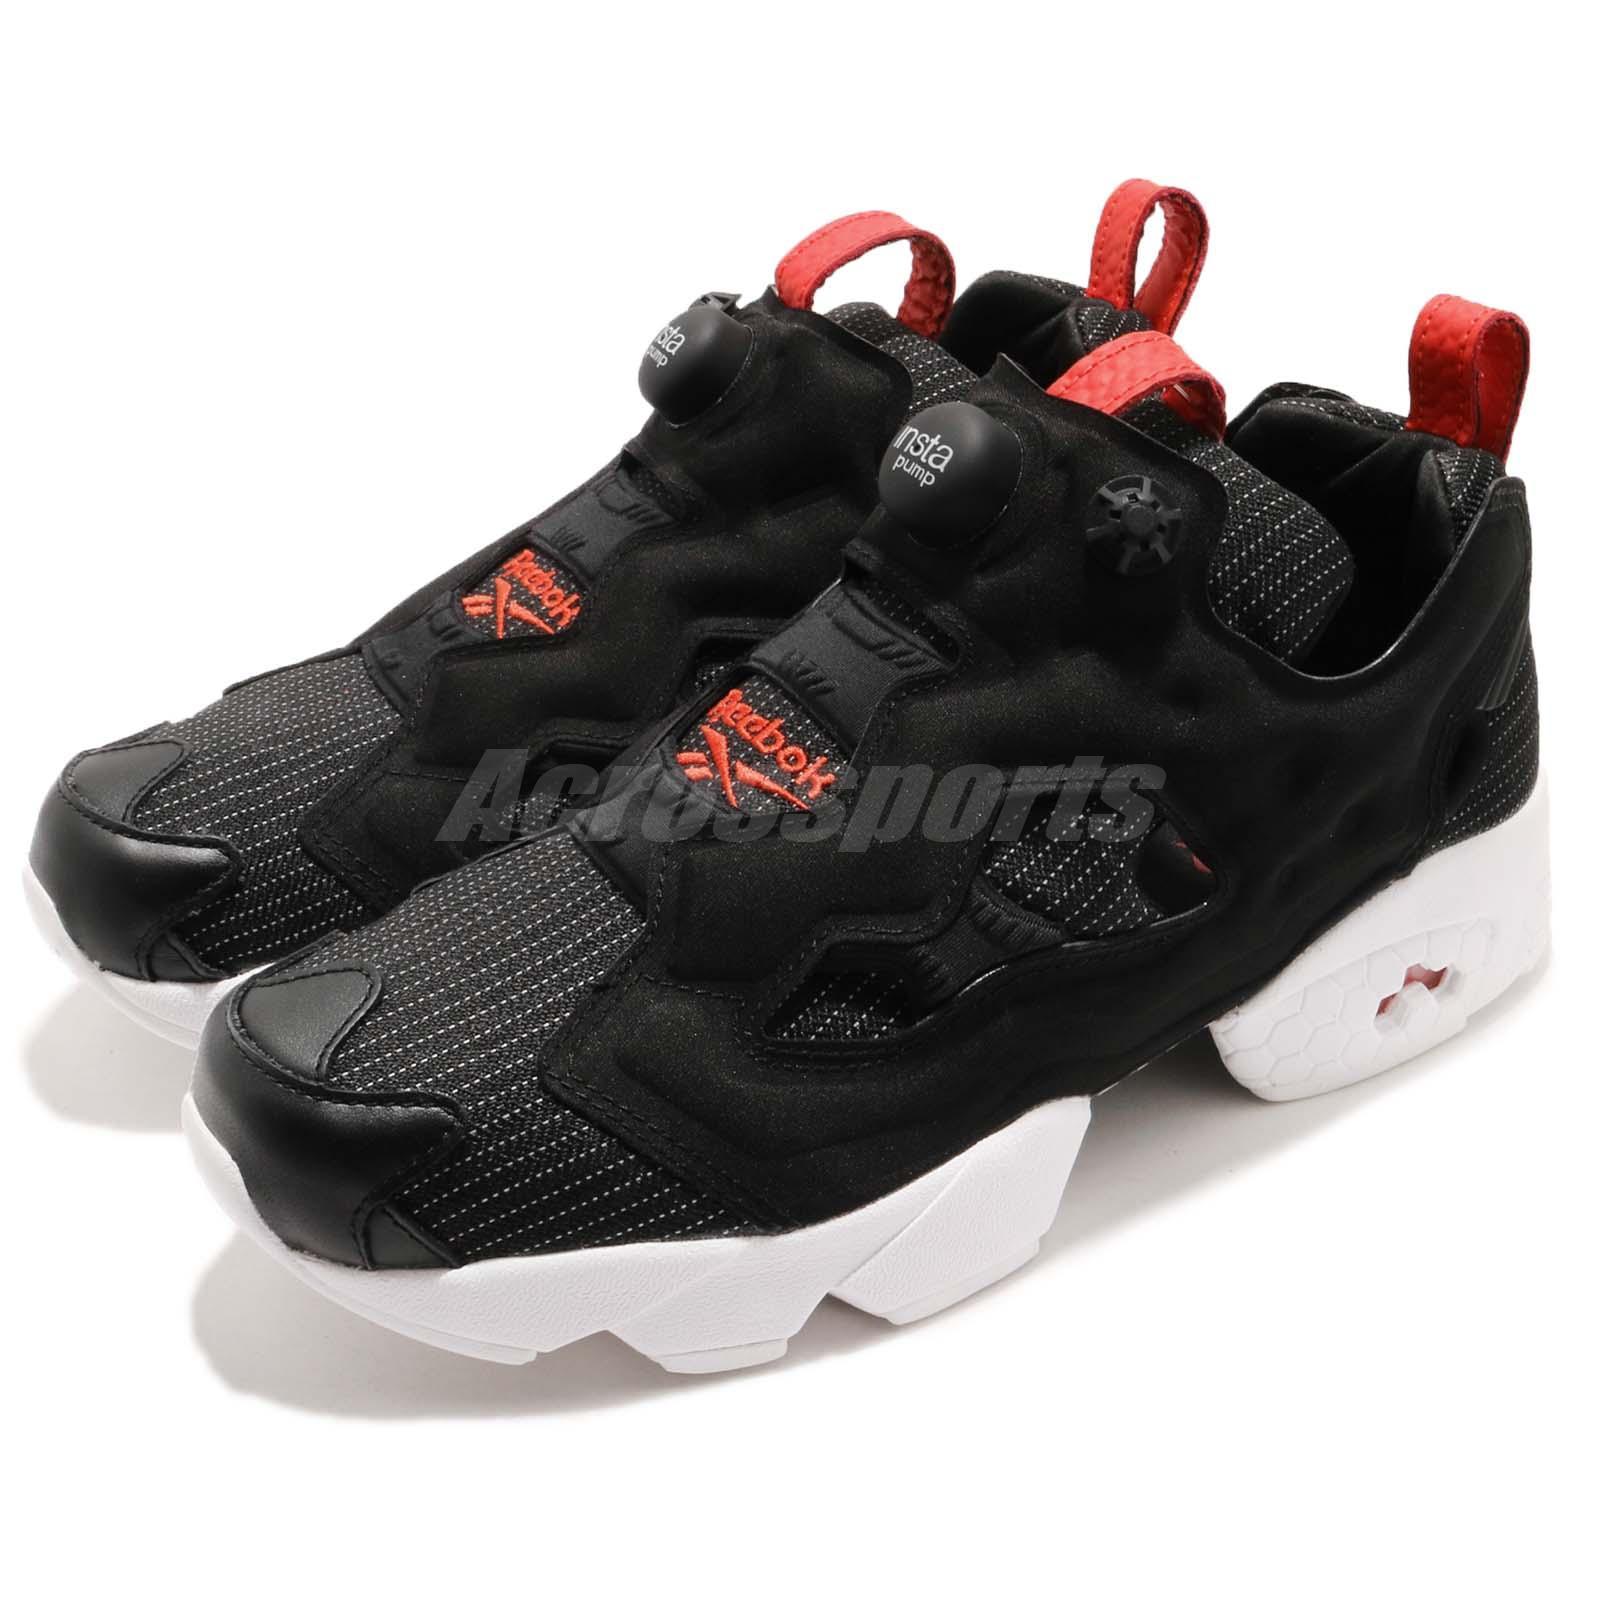 Reebok Instapump Fury MU Love Pack Black Red White Men Shoes Sneakers DV4590